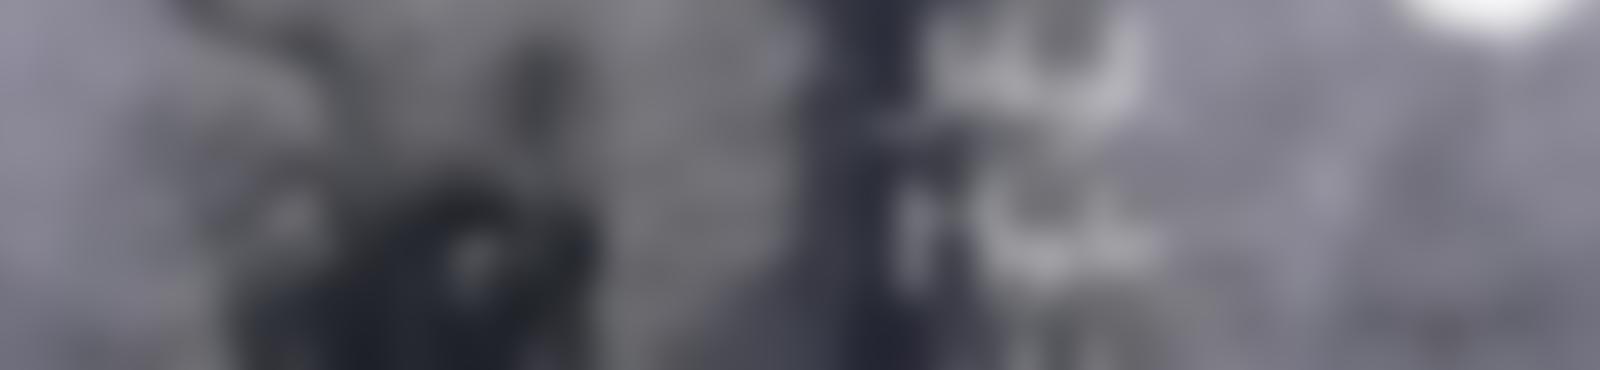 Blurred 6db890e5 bc47 427a b4ea f512a61d24ad